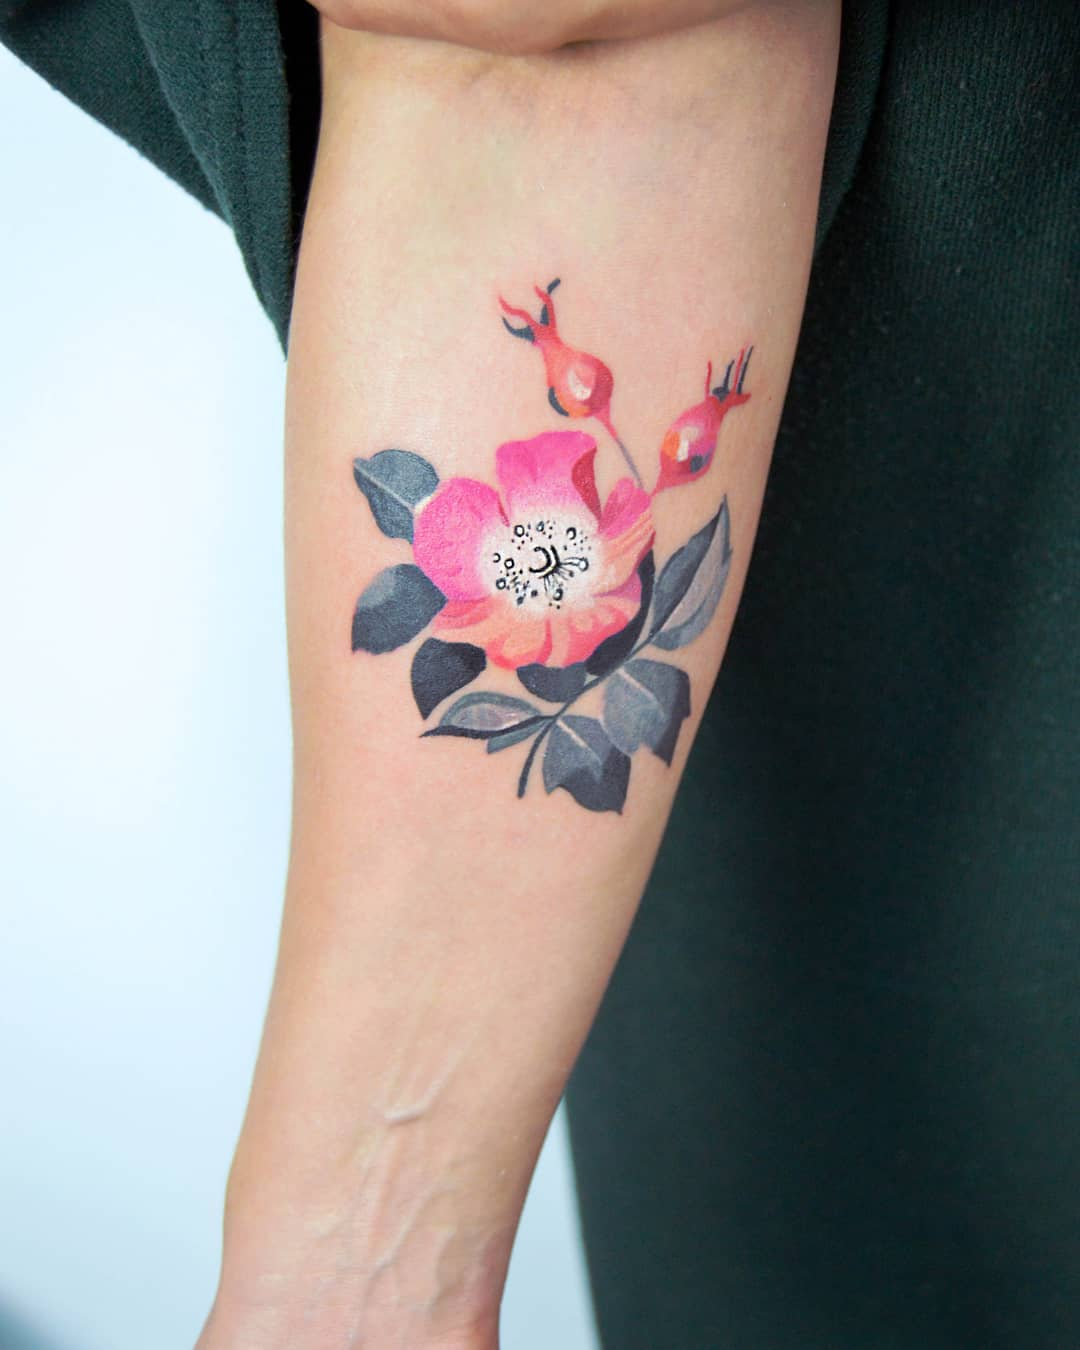 Rosehip tattoo by Mavka Leesova